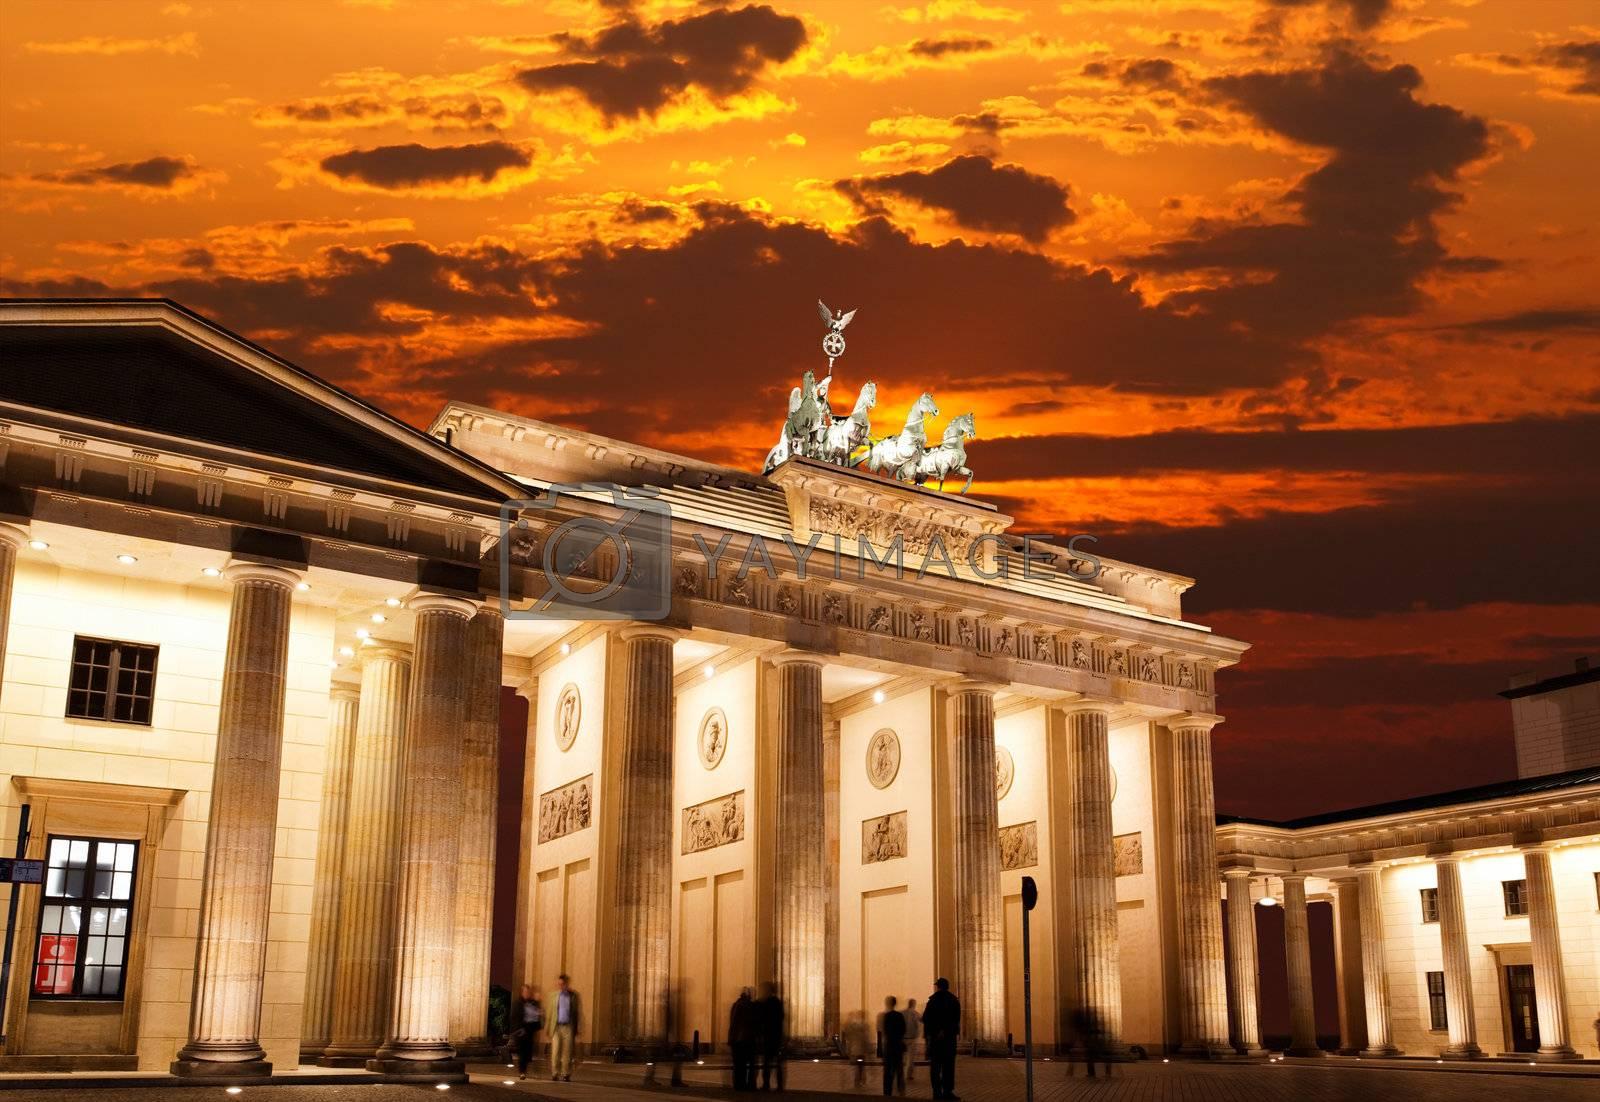 BRANDENBURG GATE at sunset in Berlin Germany